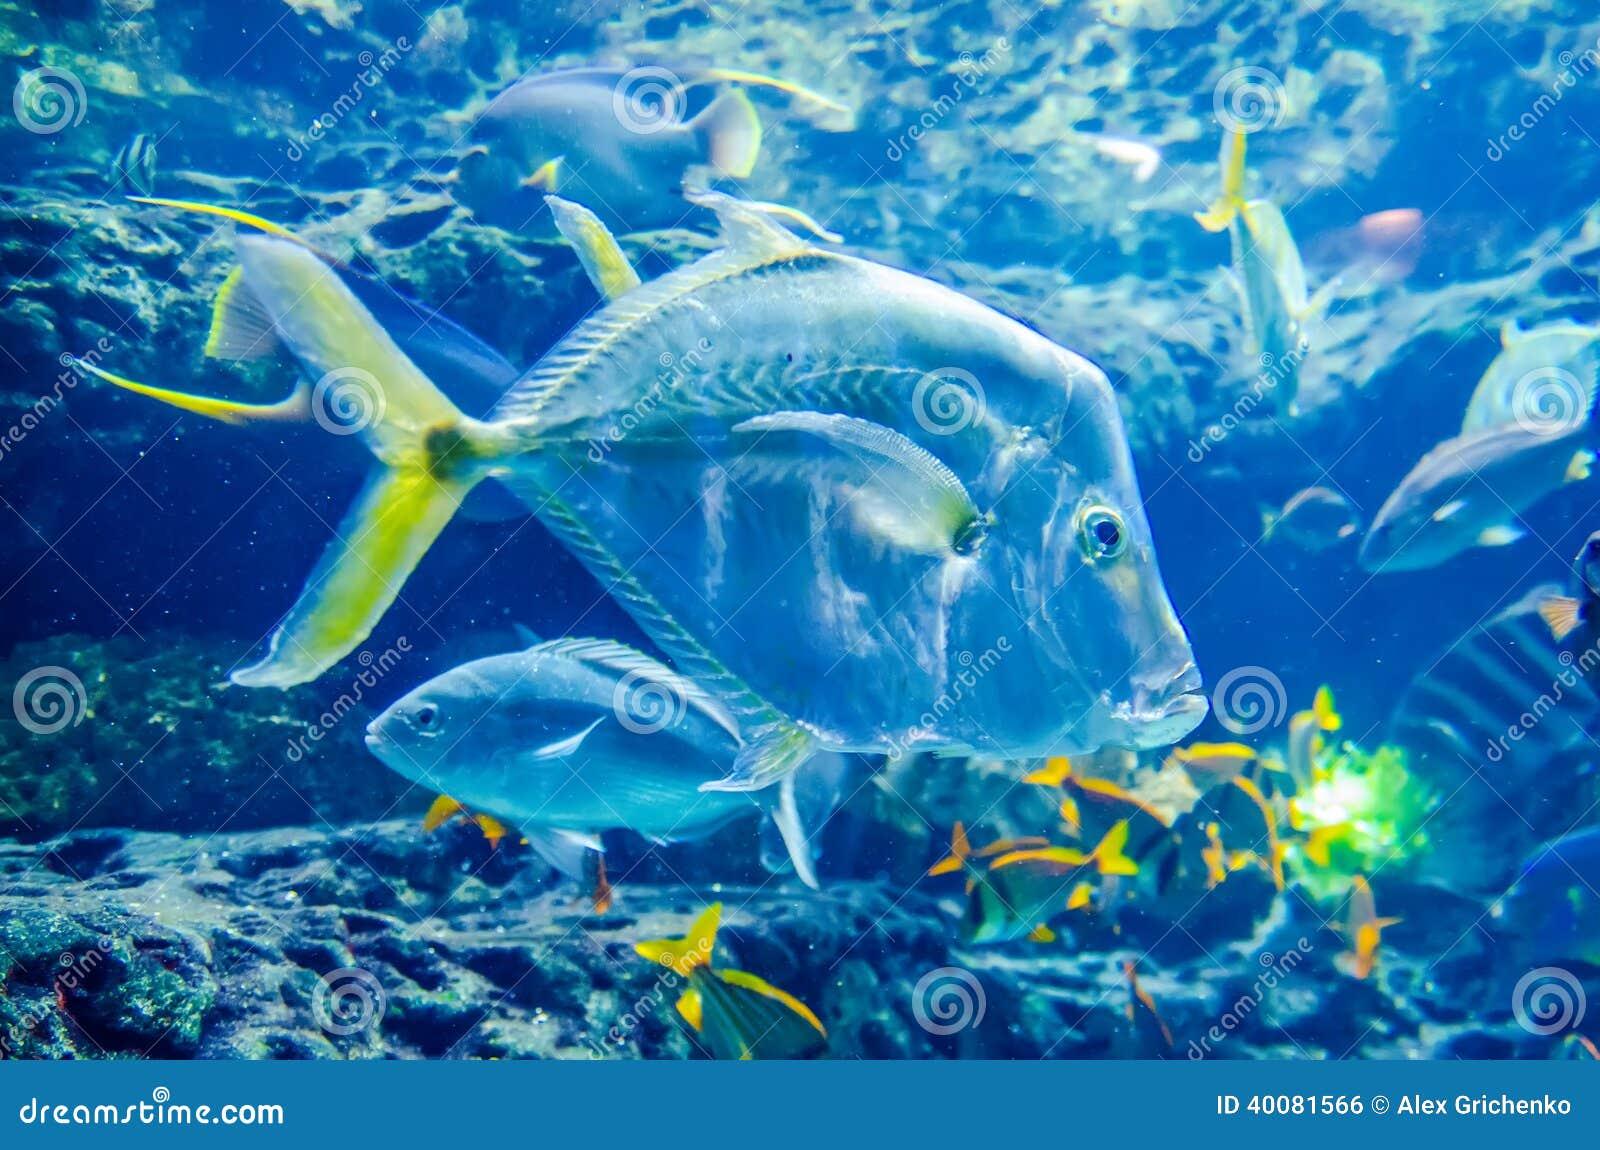 fish tank live wallpaper download